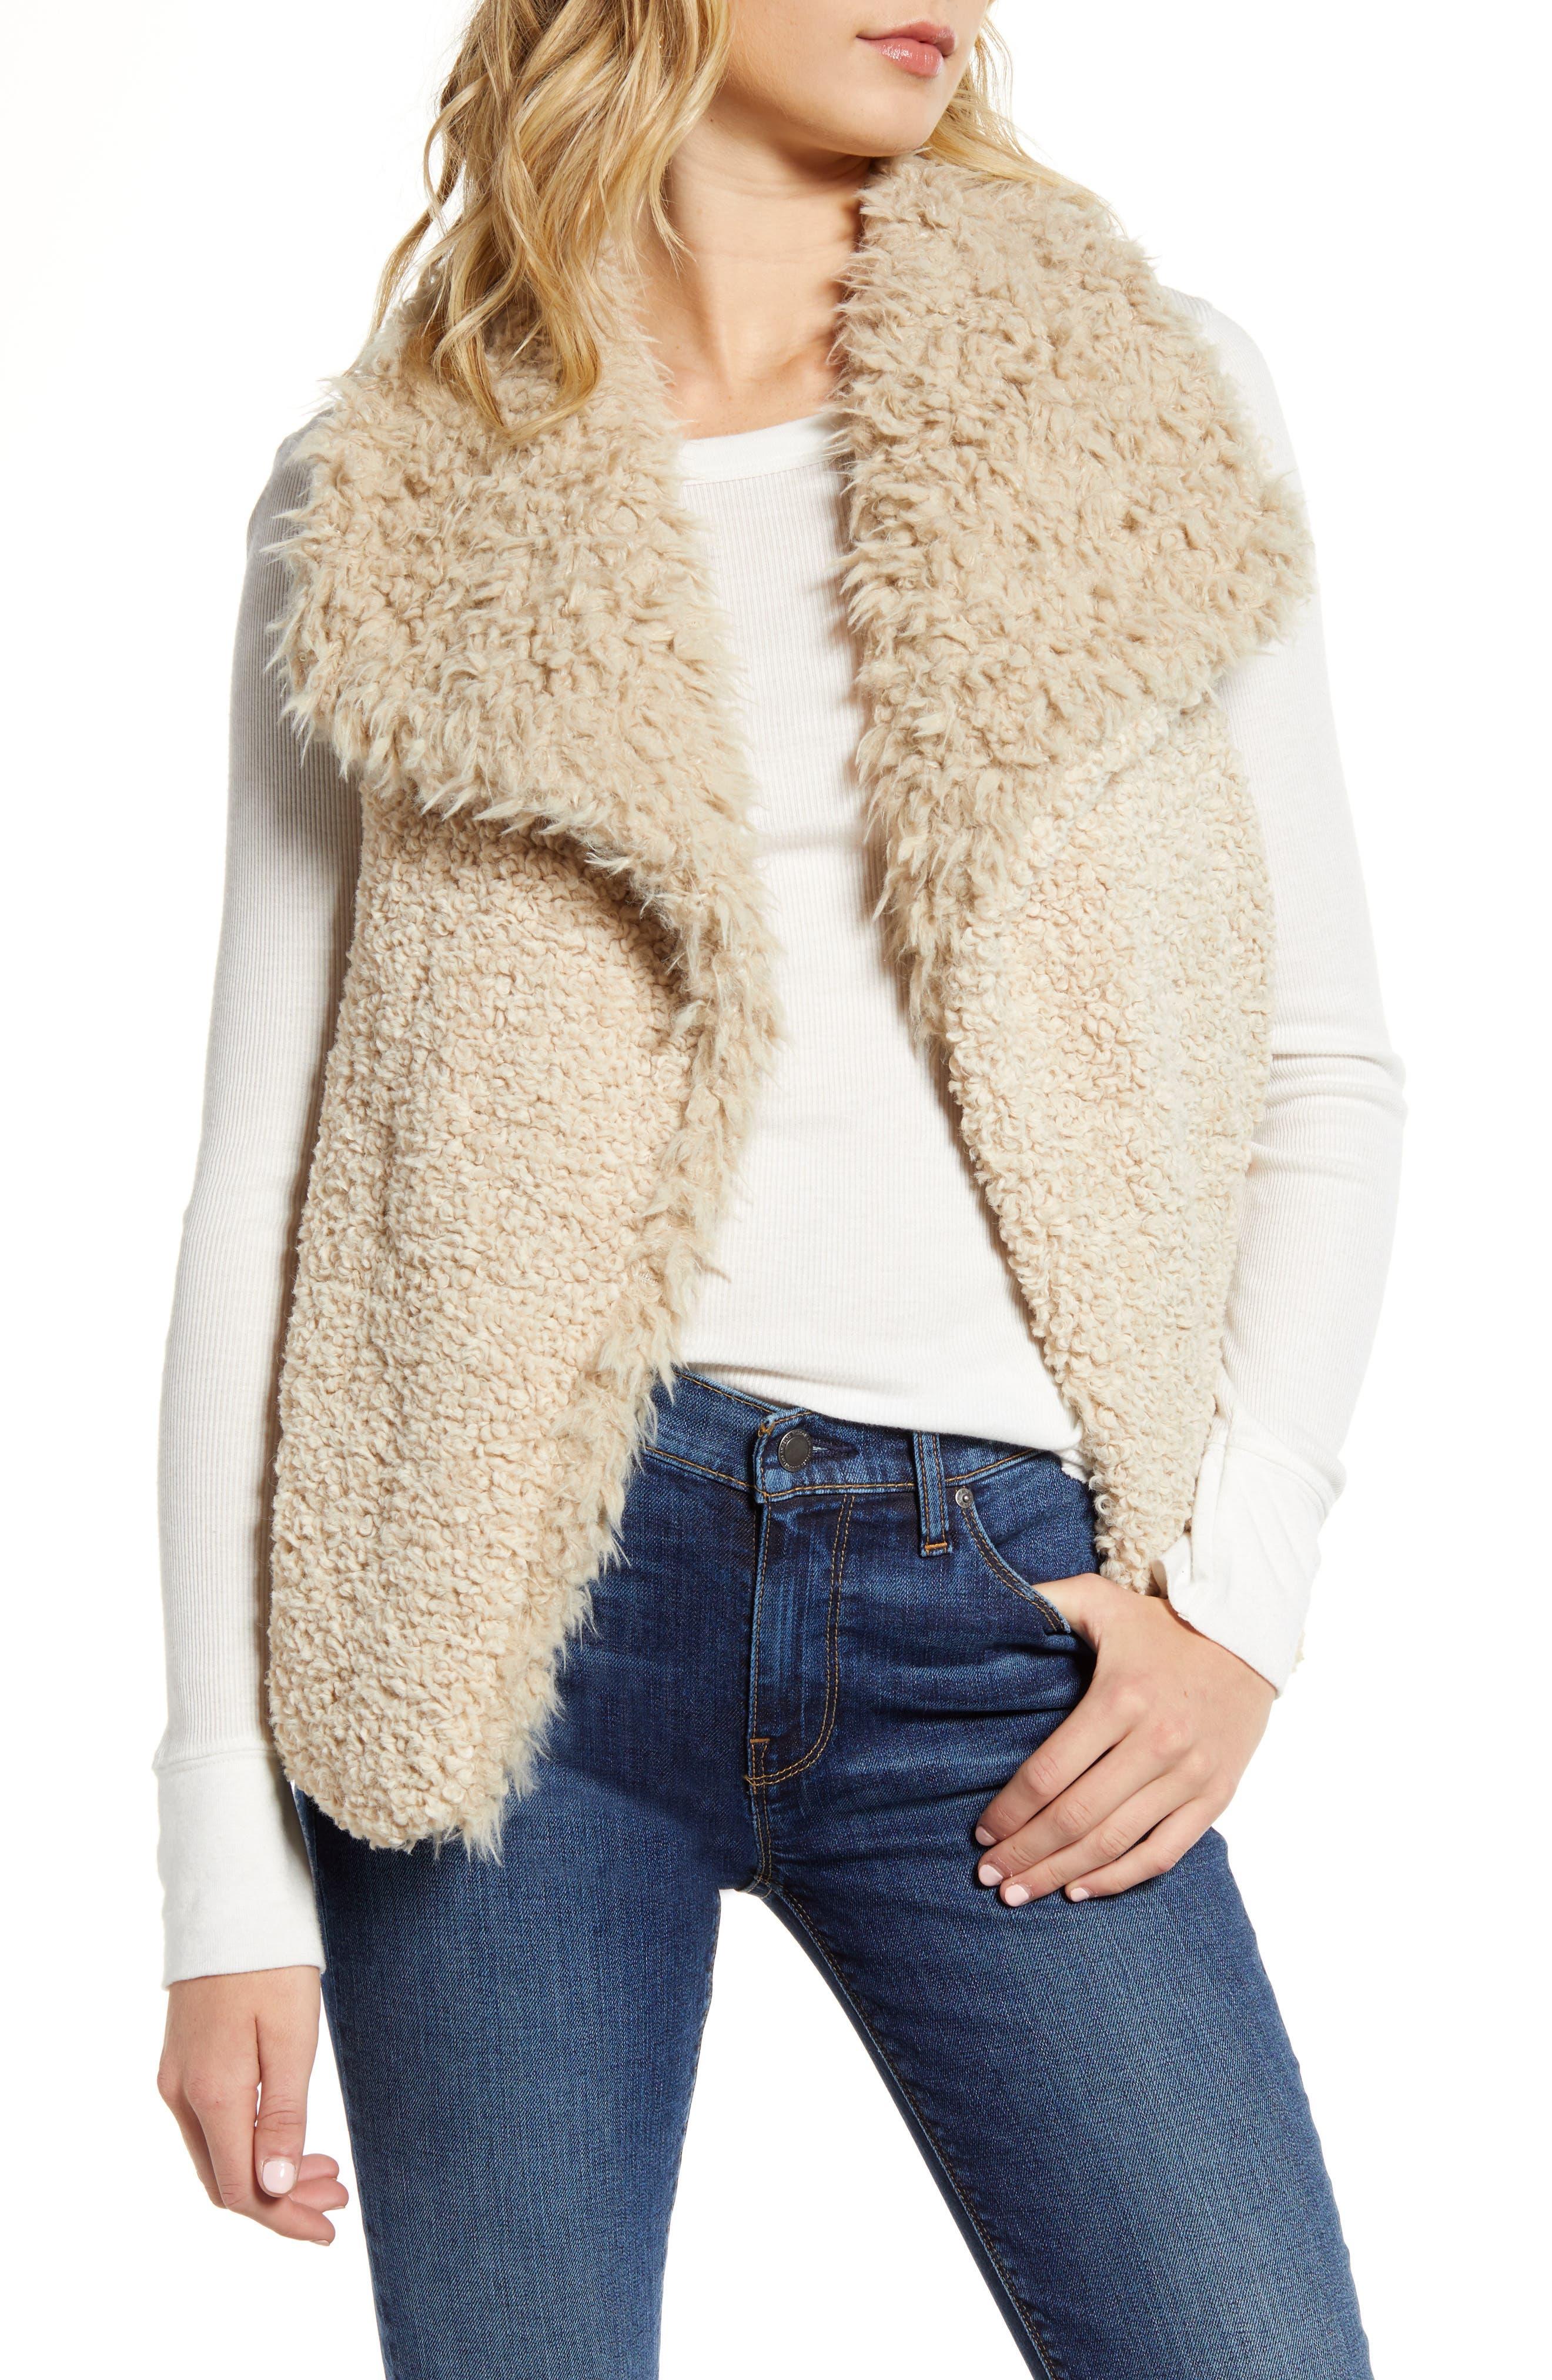 Woven Heart Reversible Faux Fur & Faux Shearling Vest